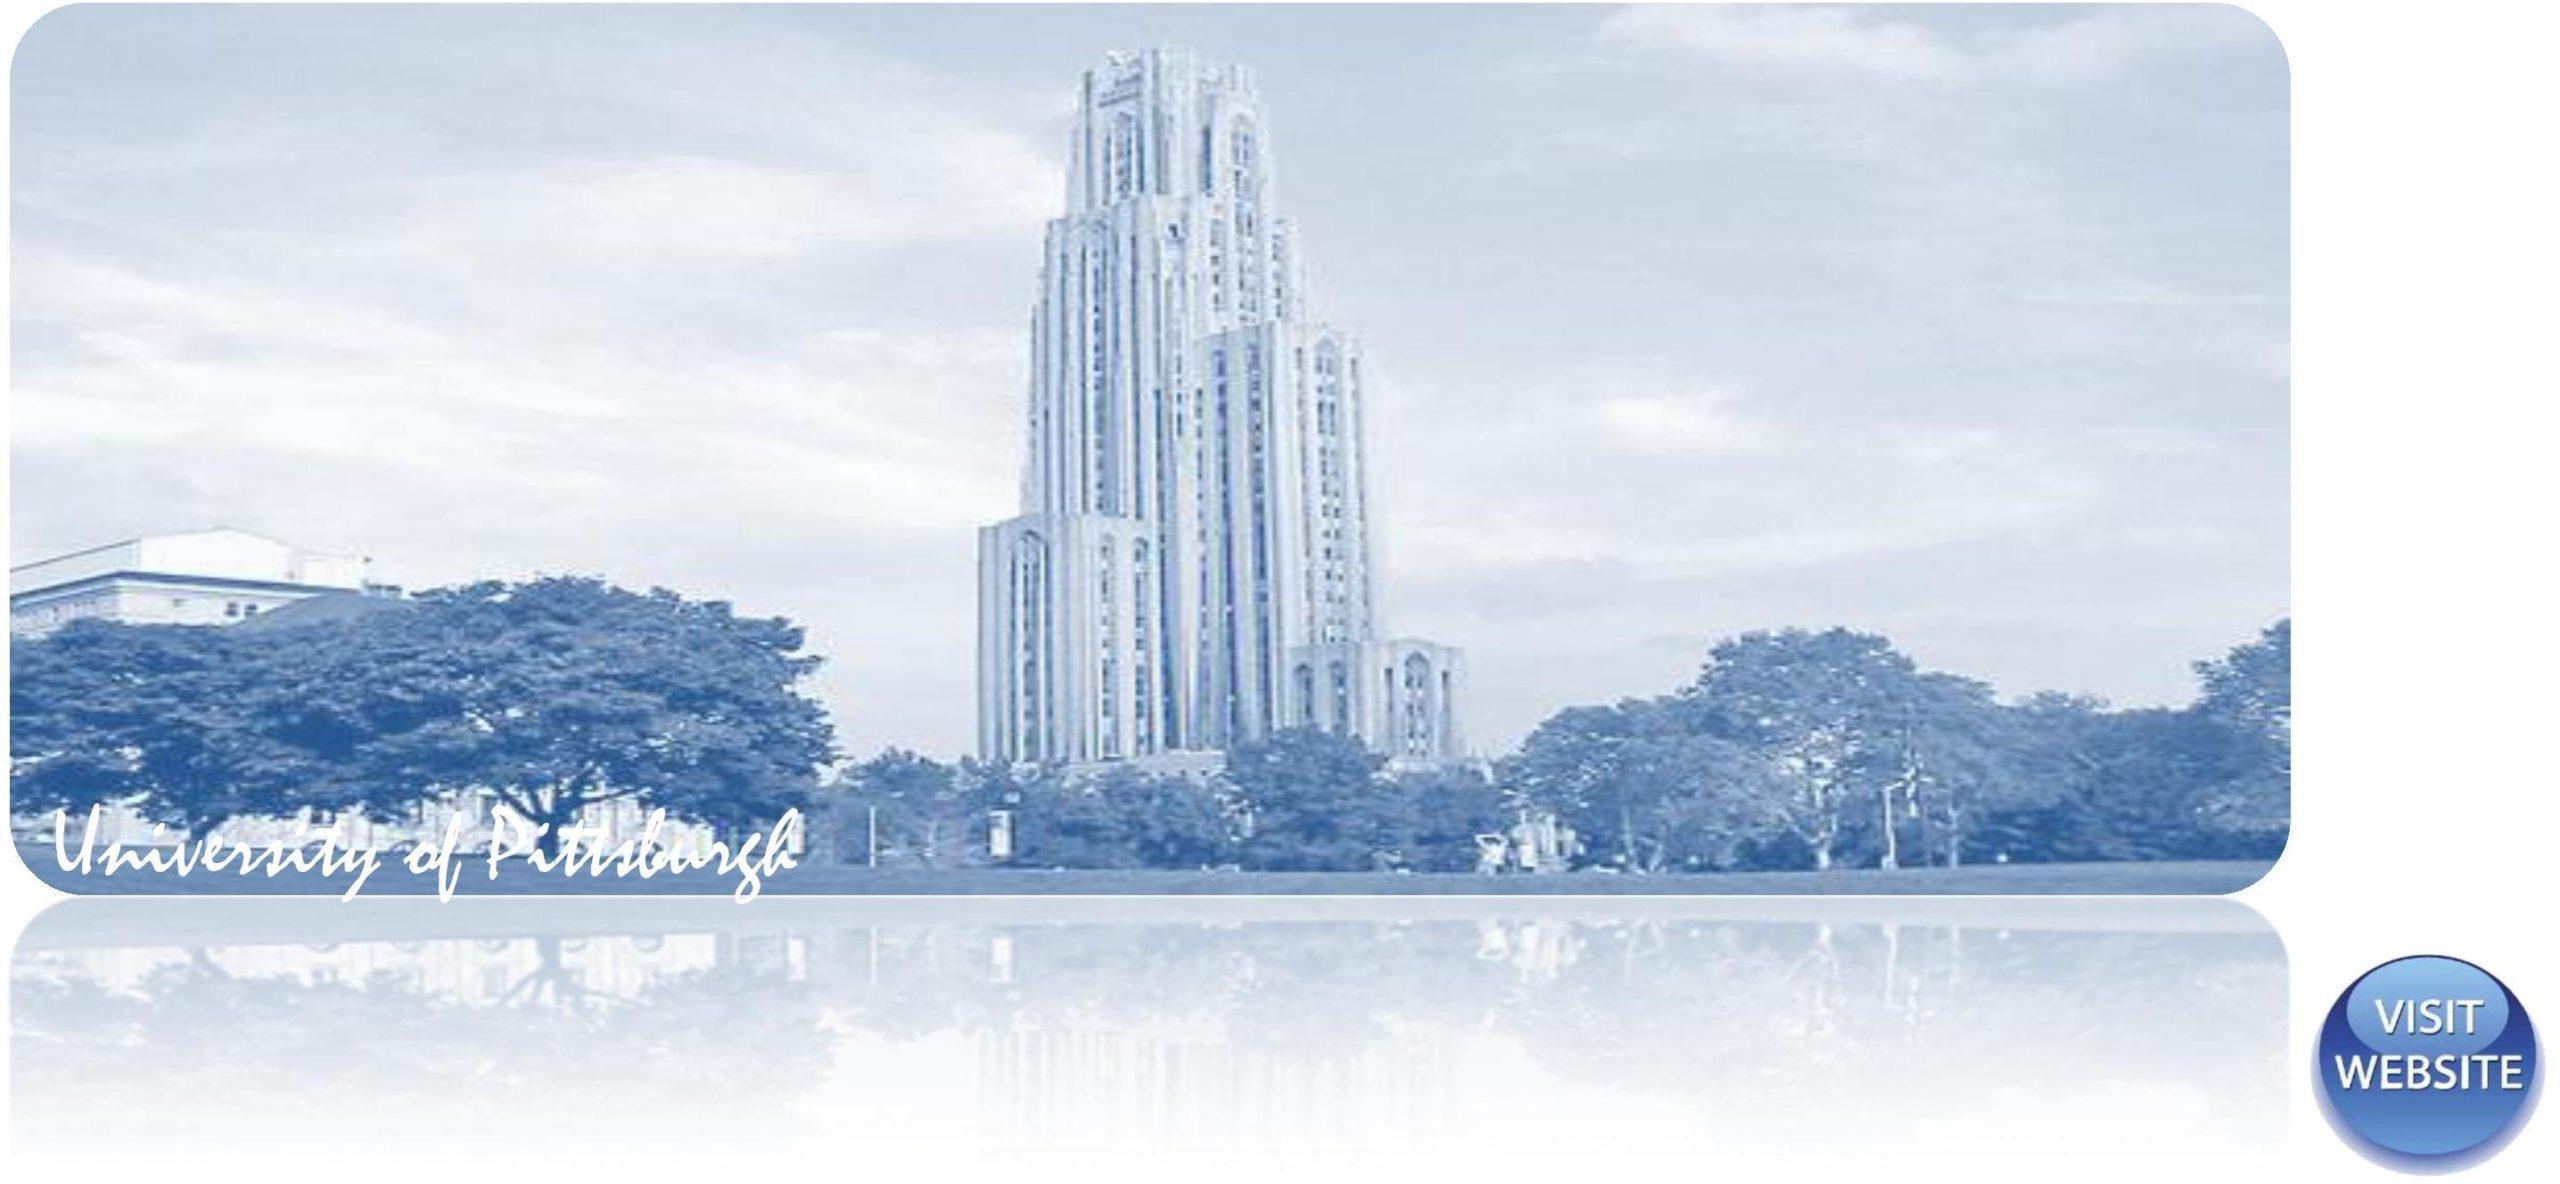 University of Pittsburgh USA